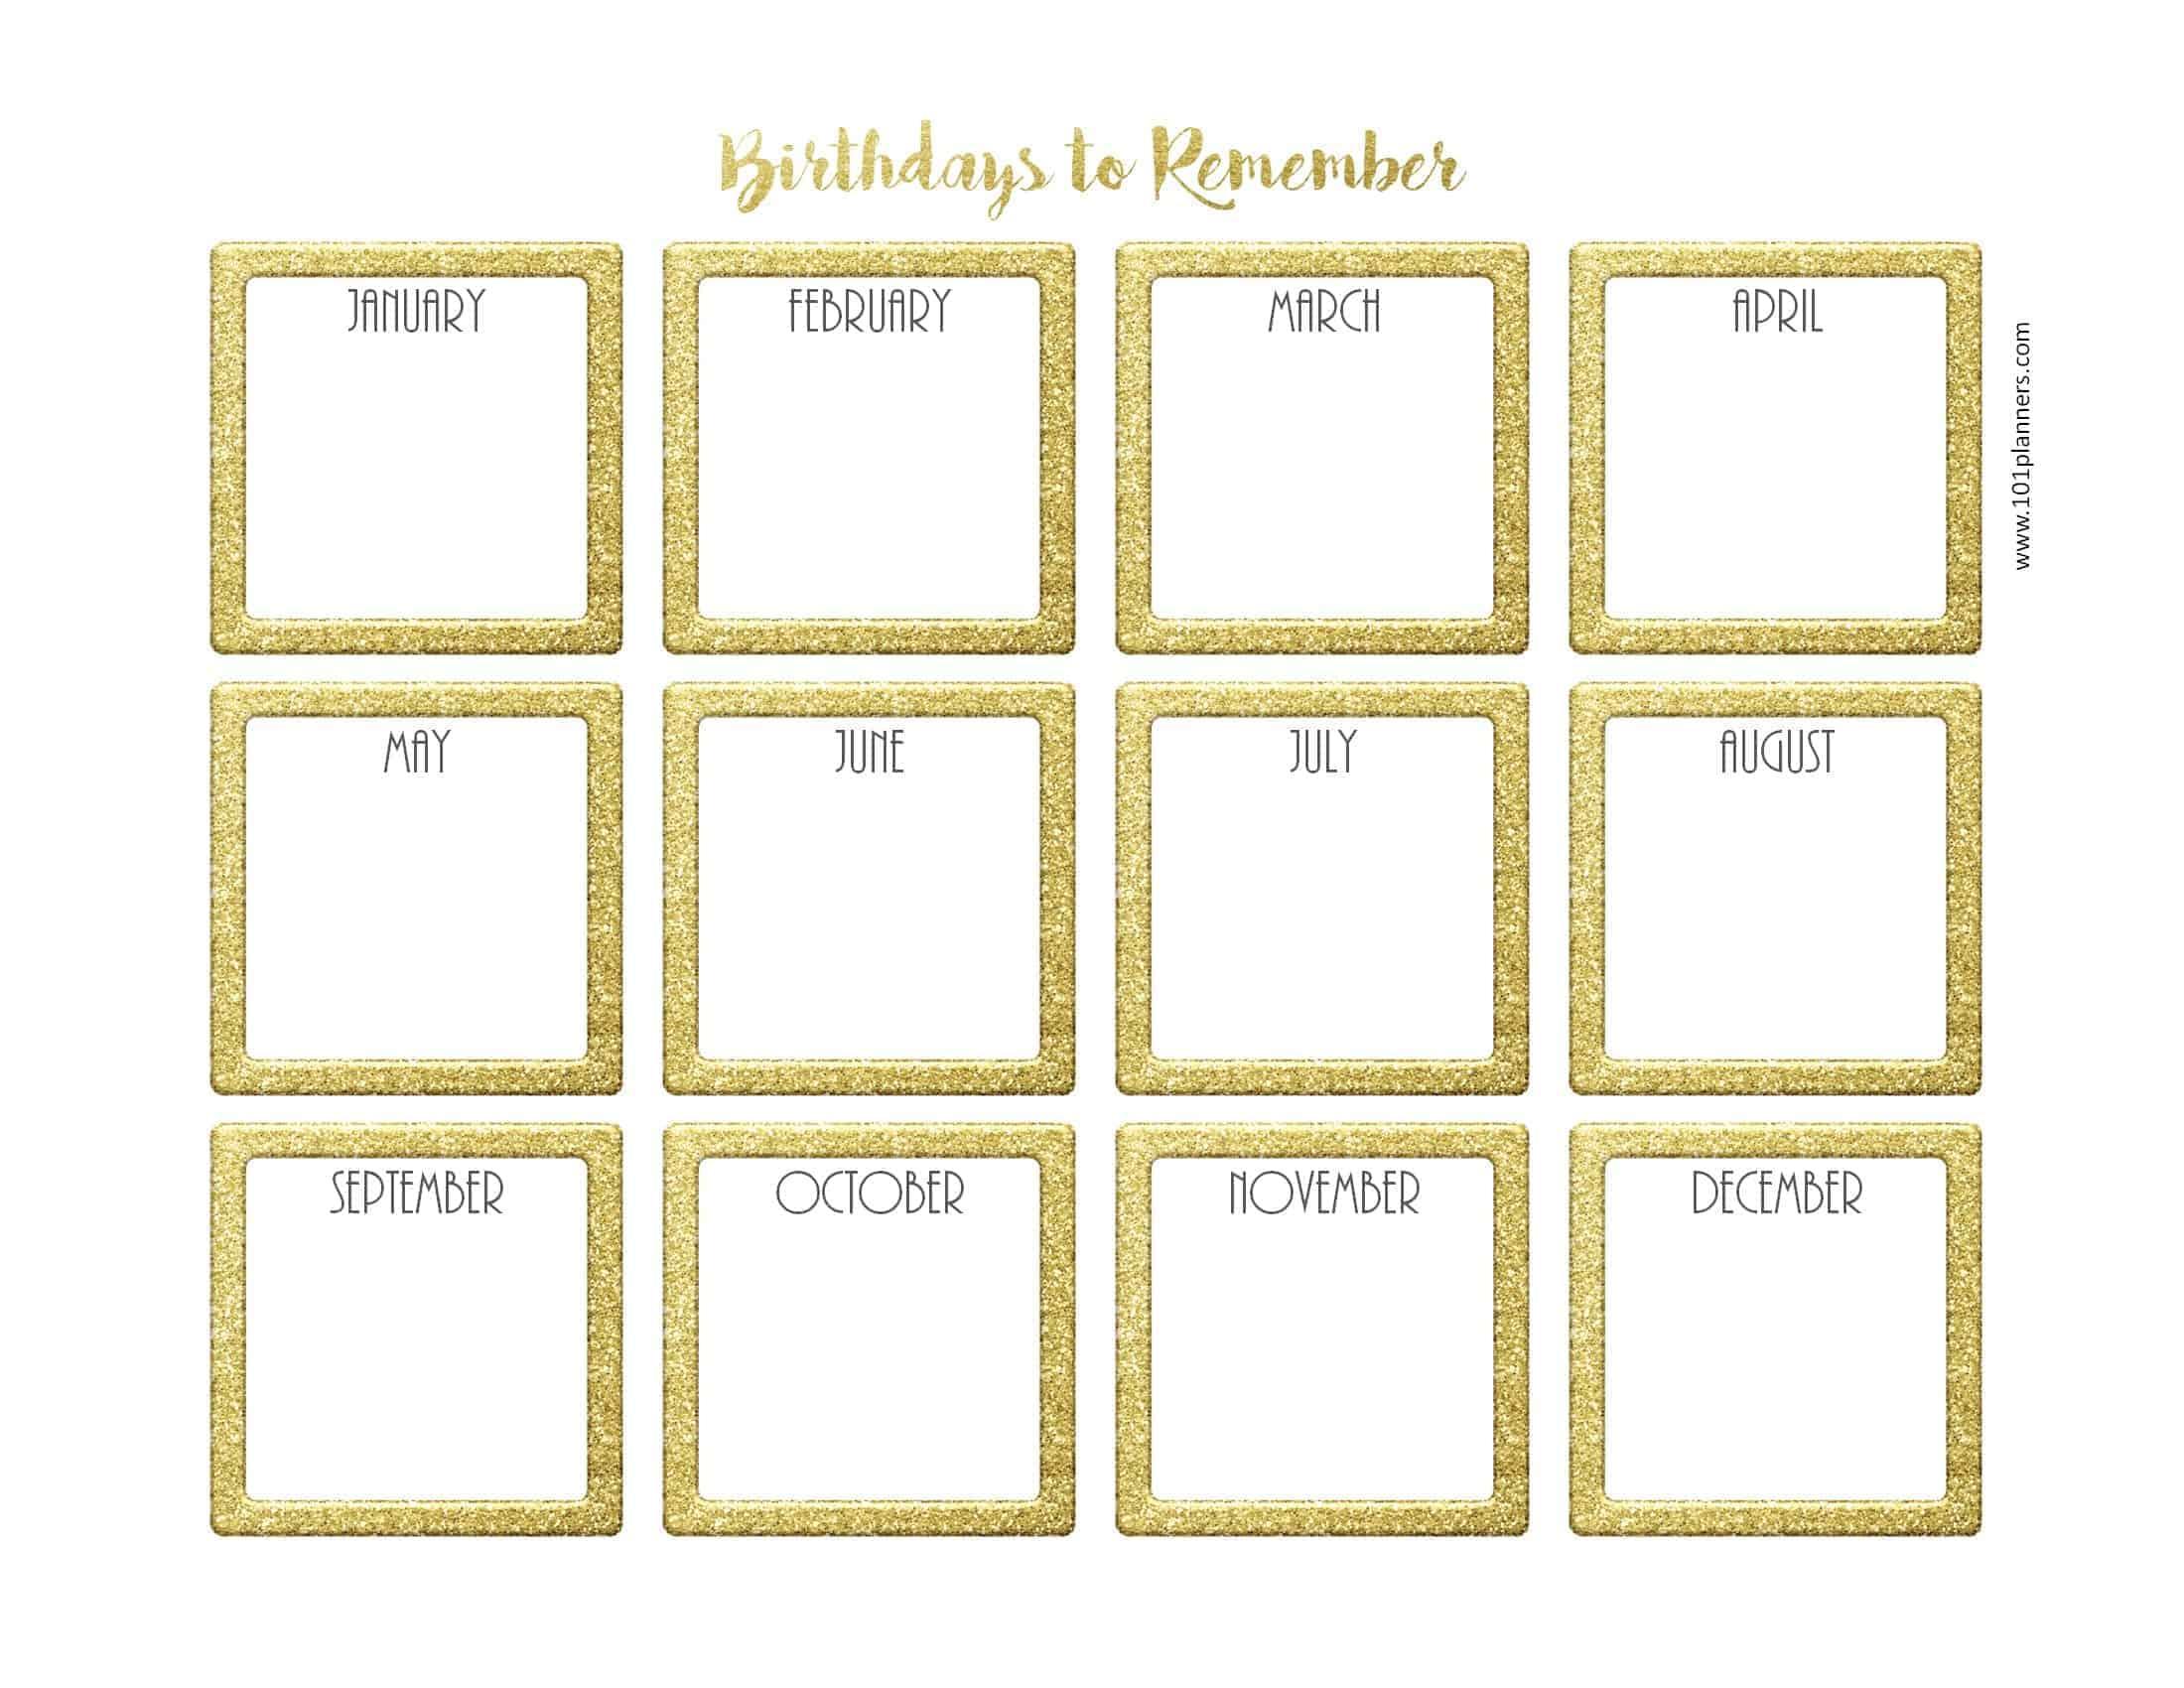 Free Birthday Calendar for Birthday Calendar Template Excel